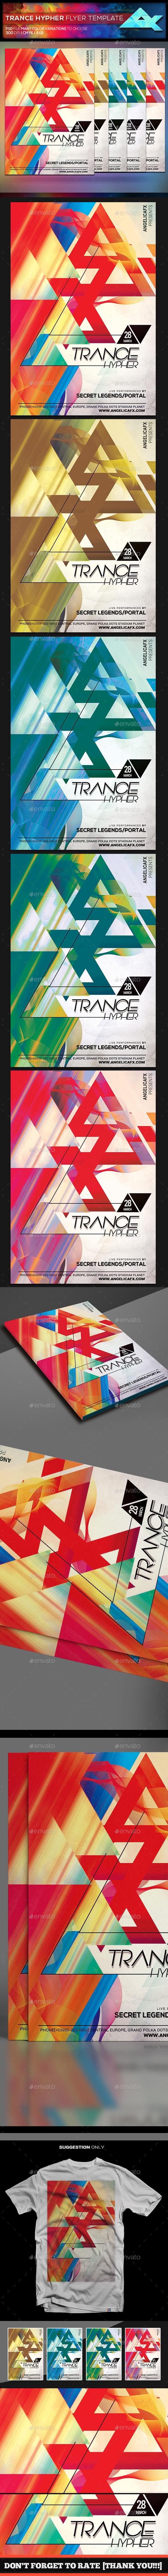 Trance Hypher Flyer Template - Flyers Print Templates